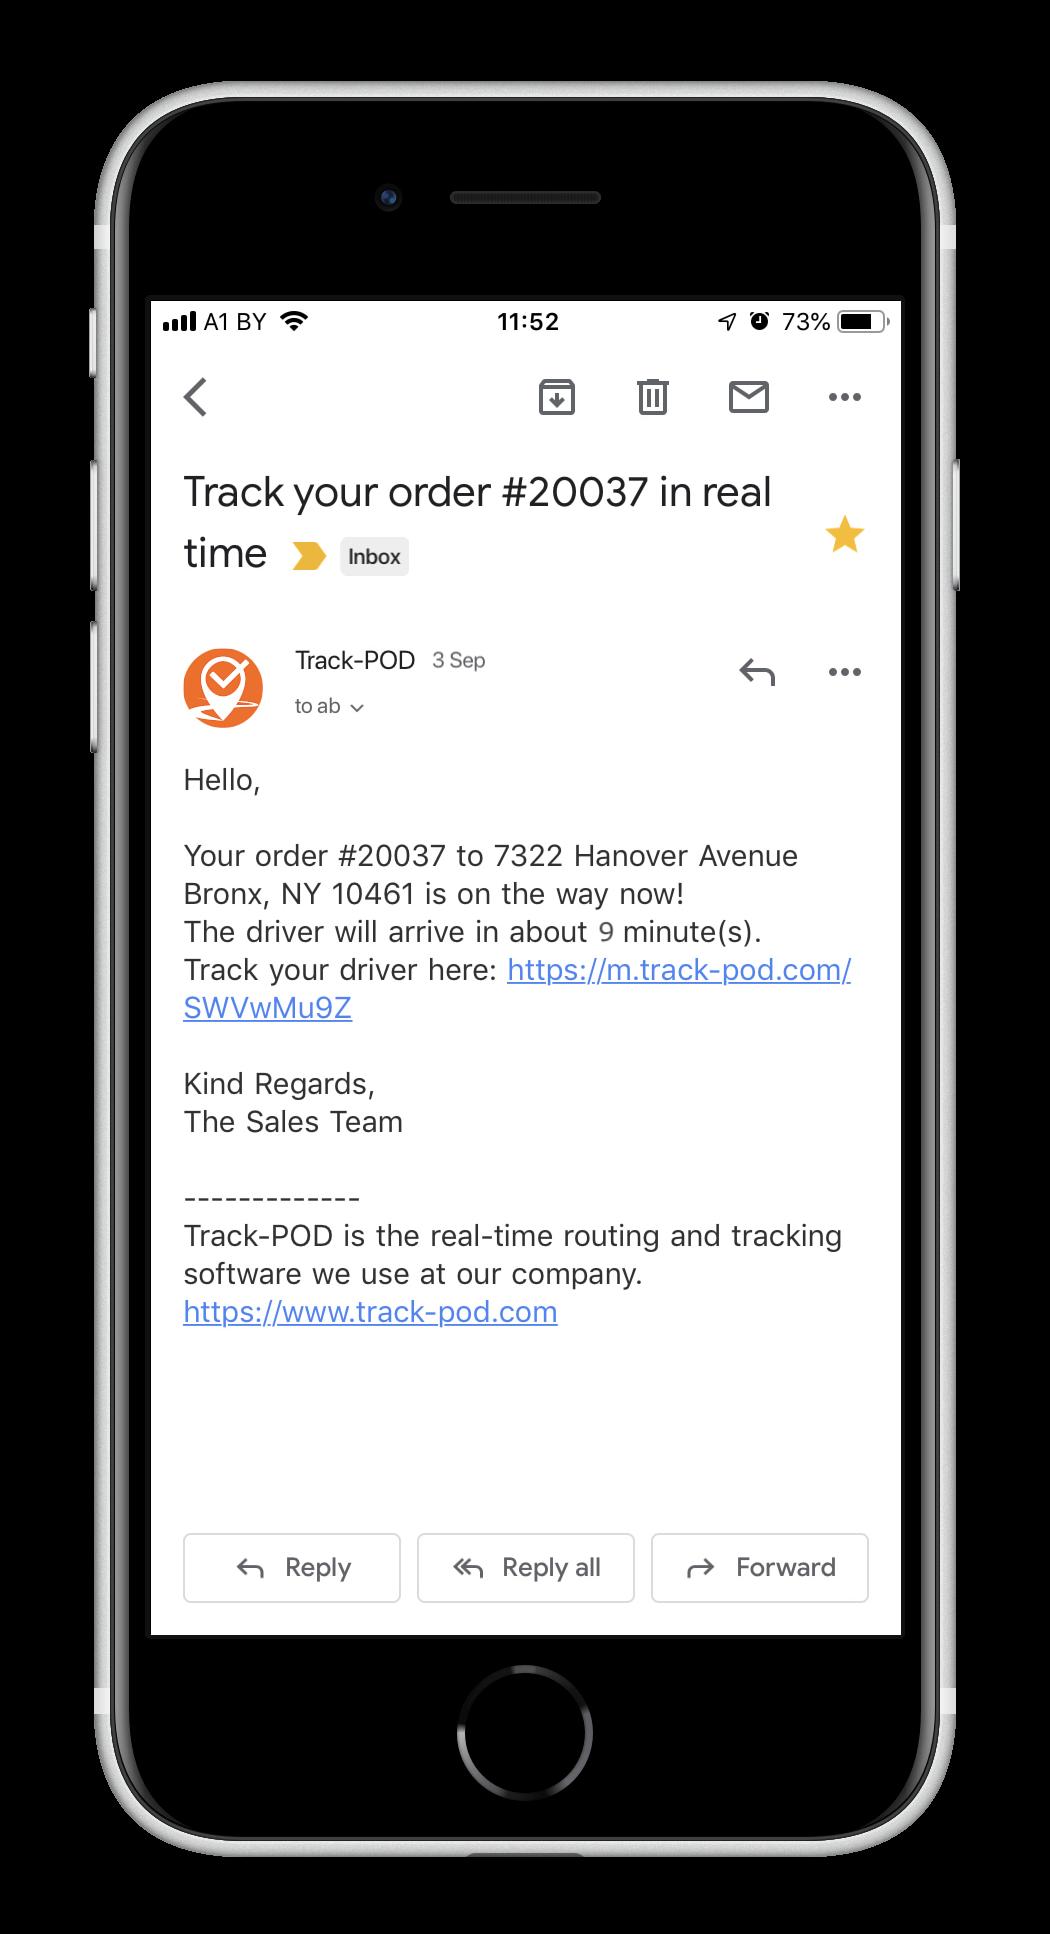 ETA notification to customer - Track-POD